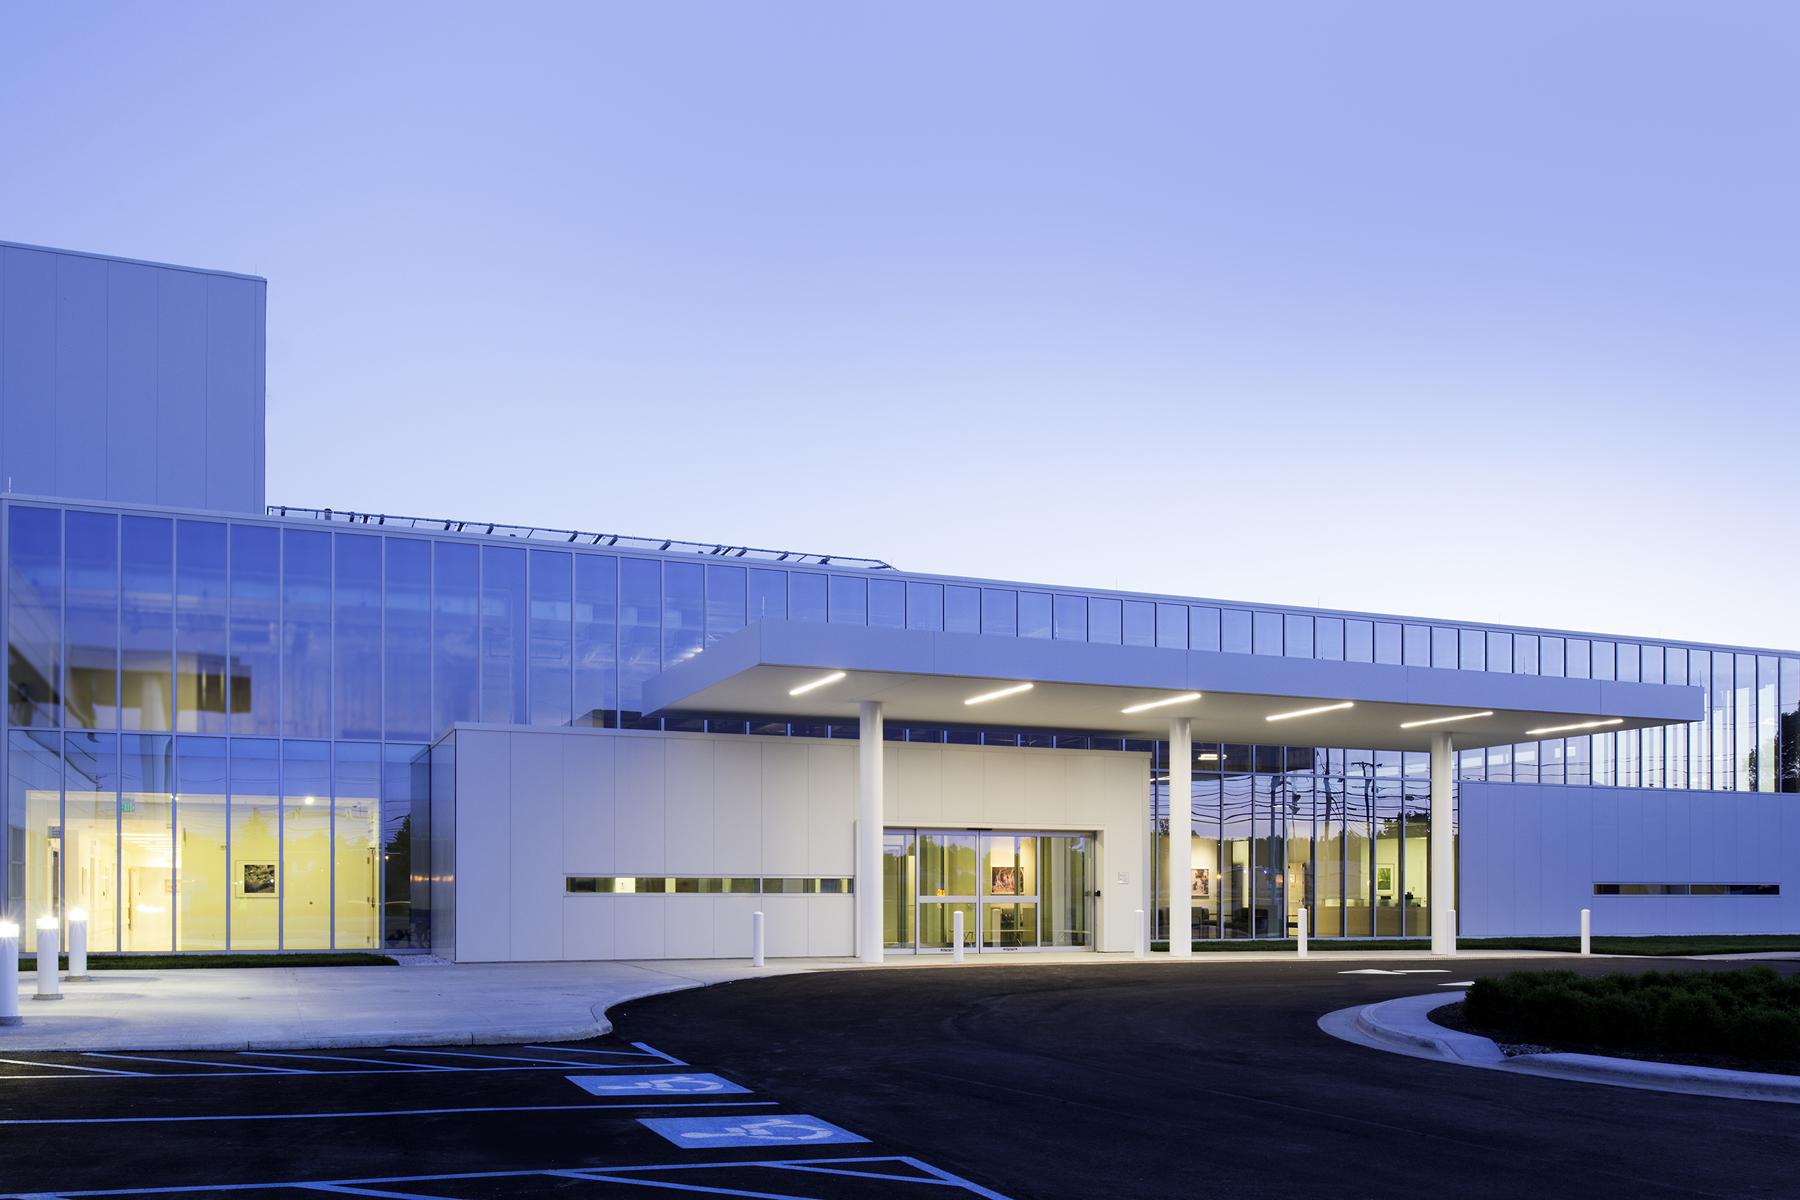 Aia Announces 2015 Healthcare Design Awards Architect Magazine